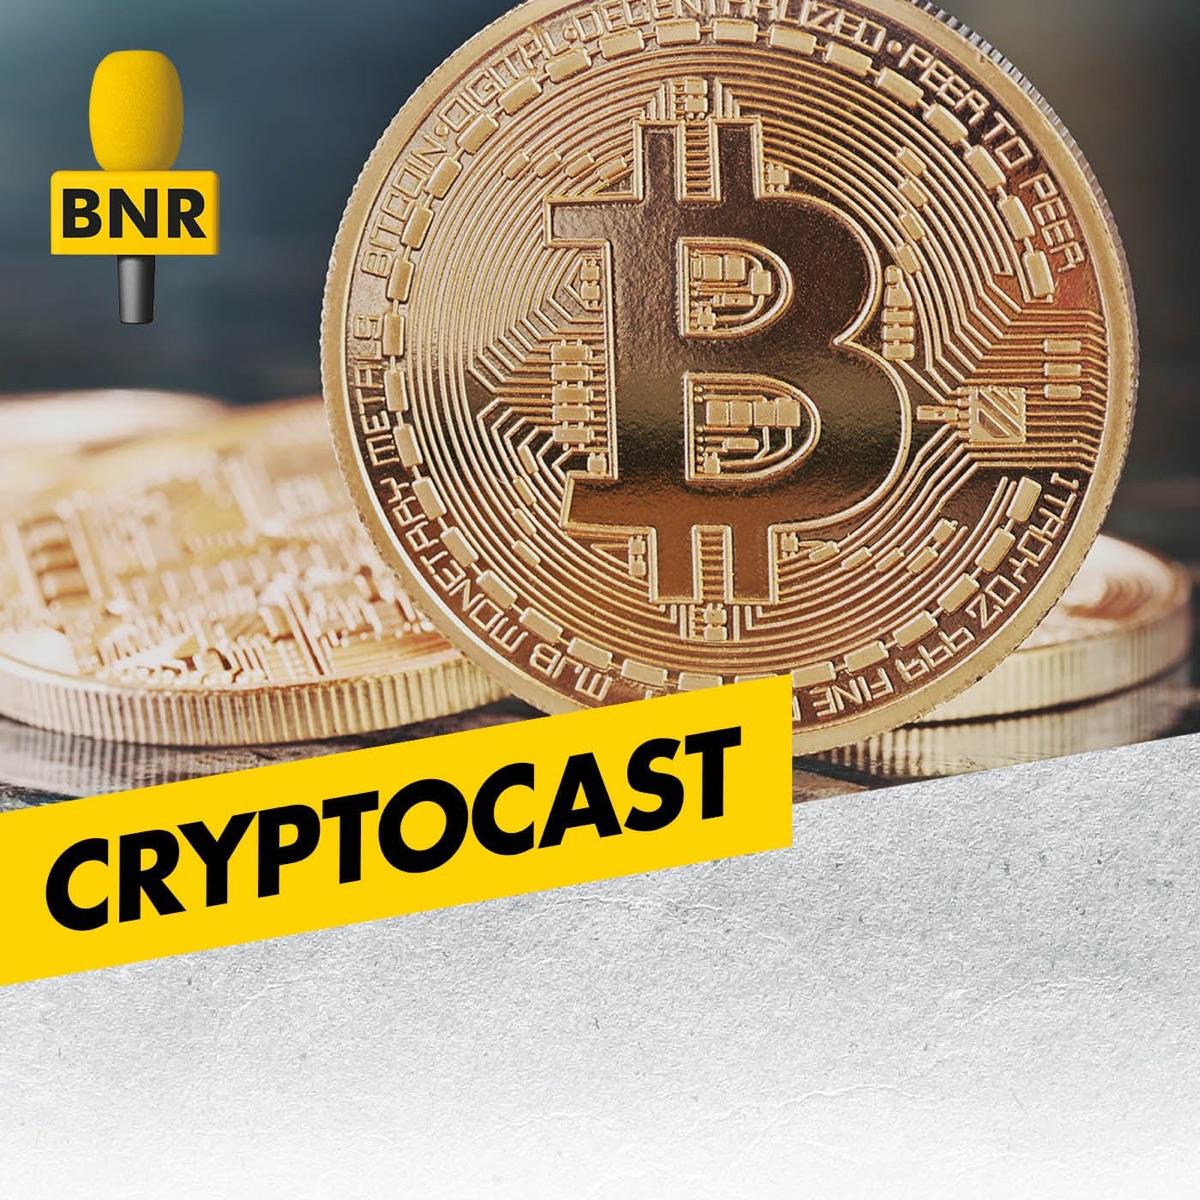 Cryptocast   BNR